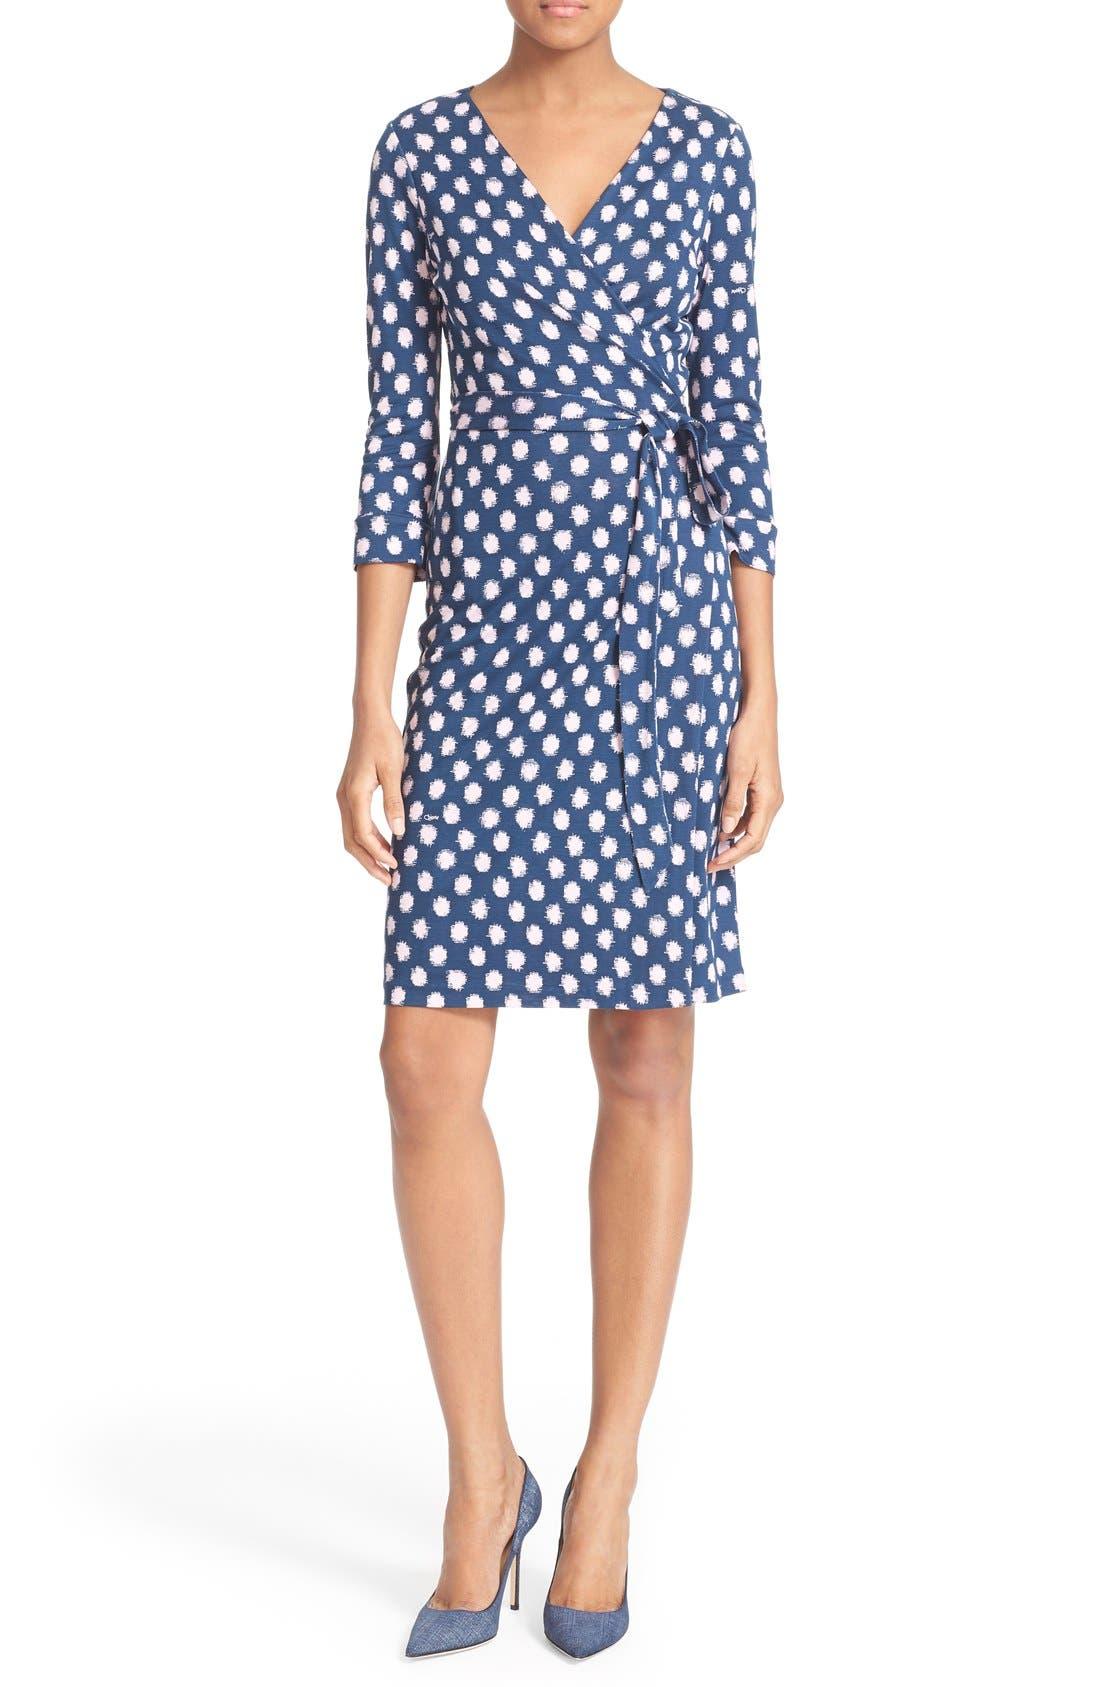 Main Image - Diane von Furstenberg 'New Julian Two' Polka Dot Silk Wrap Dress (Nordstrom Exclusive)